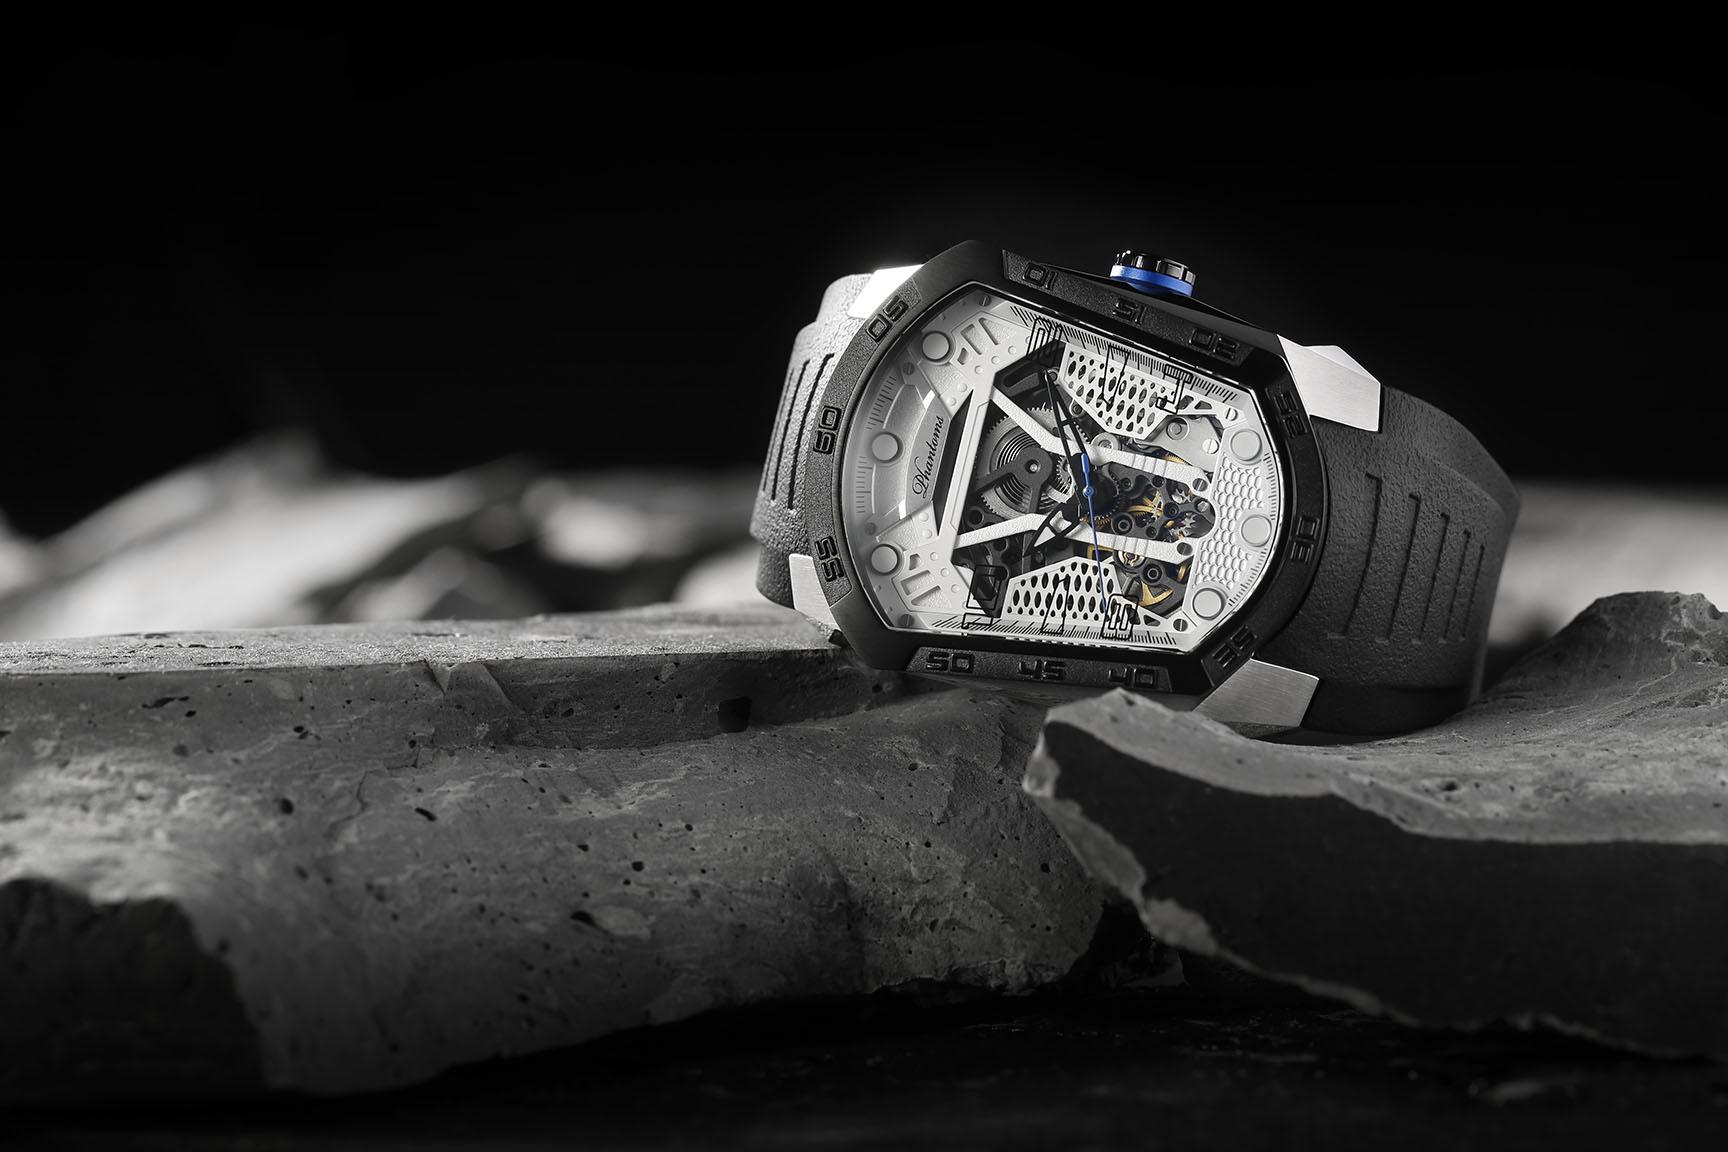 Hurricane Blade mechanical watch white automatic watch phantoms tourbillon White dial sports Watch Rubber Strap